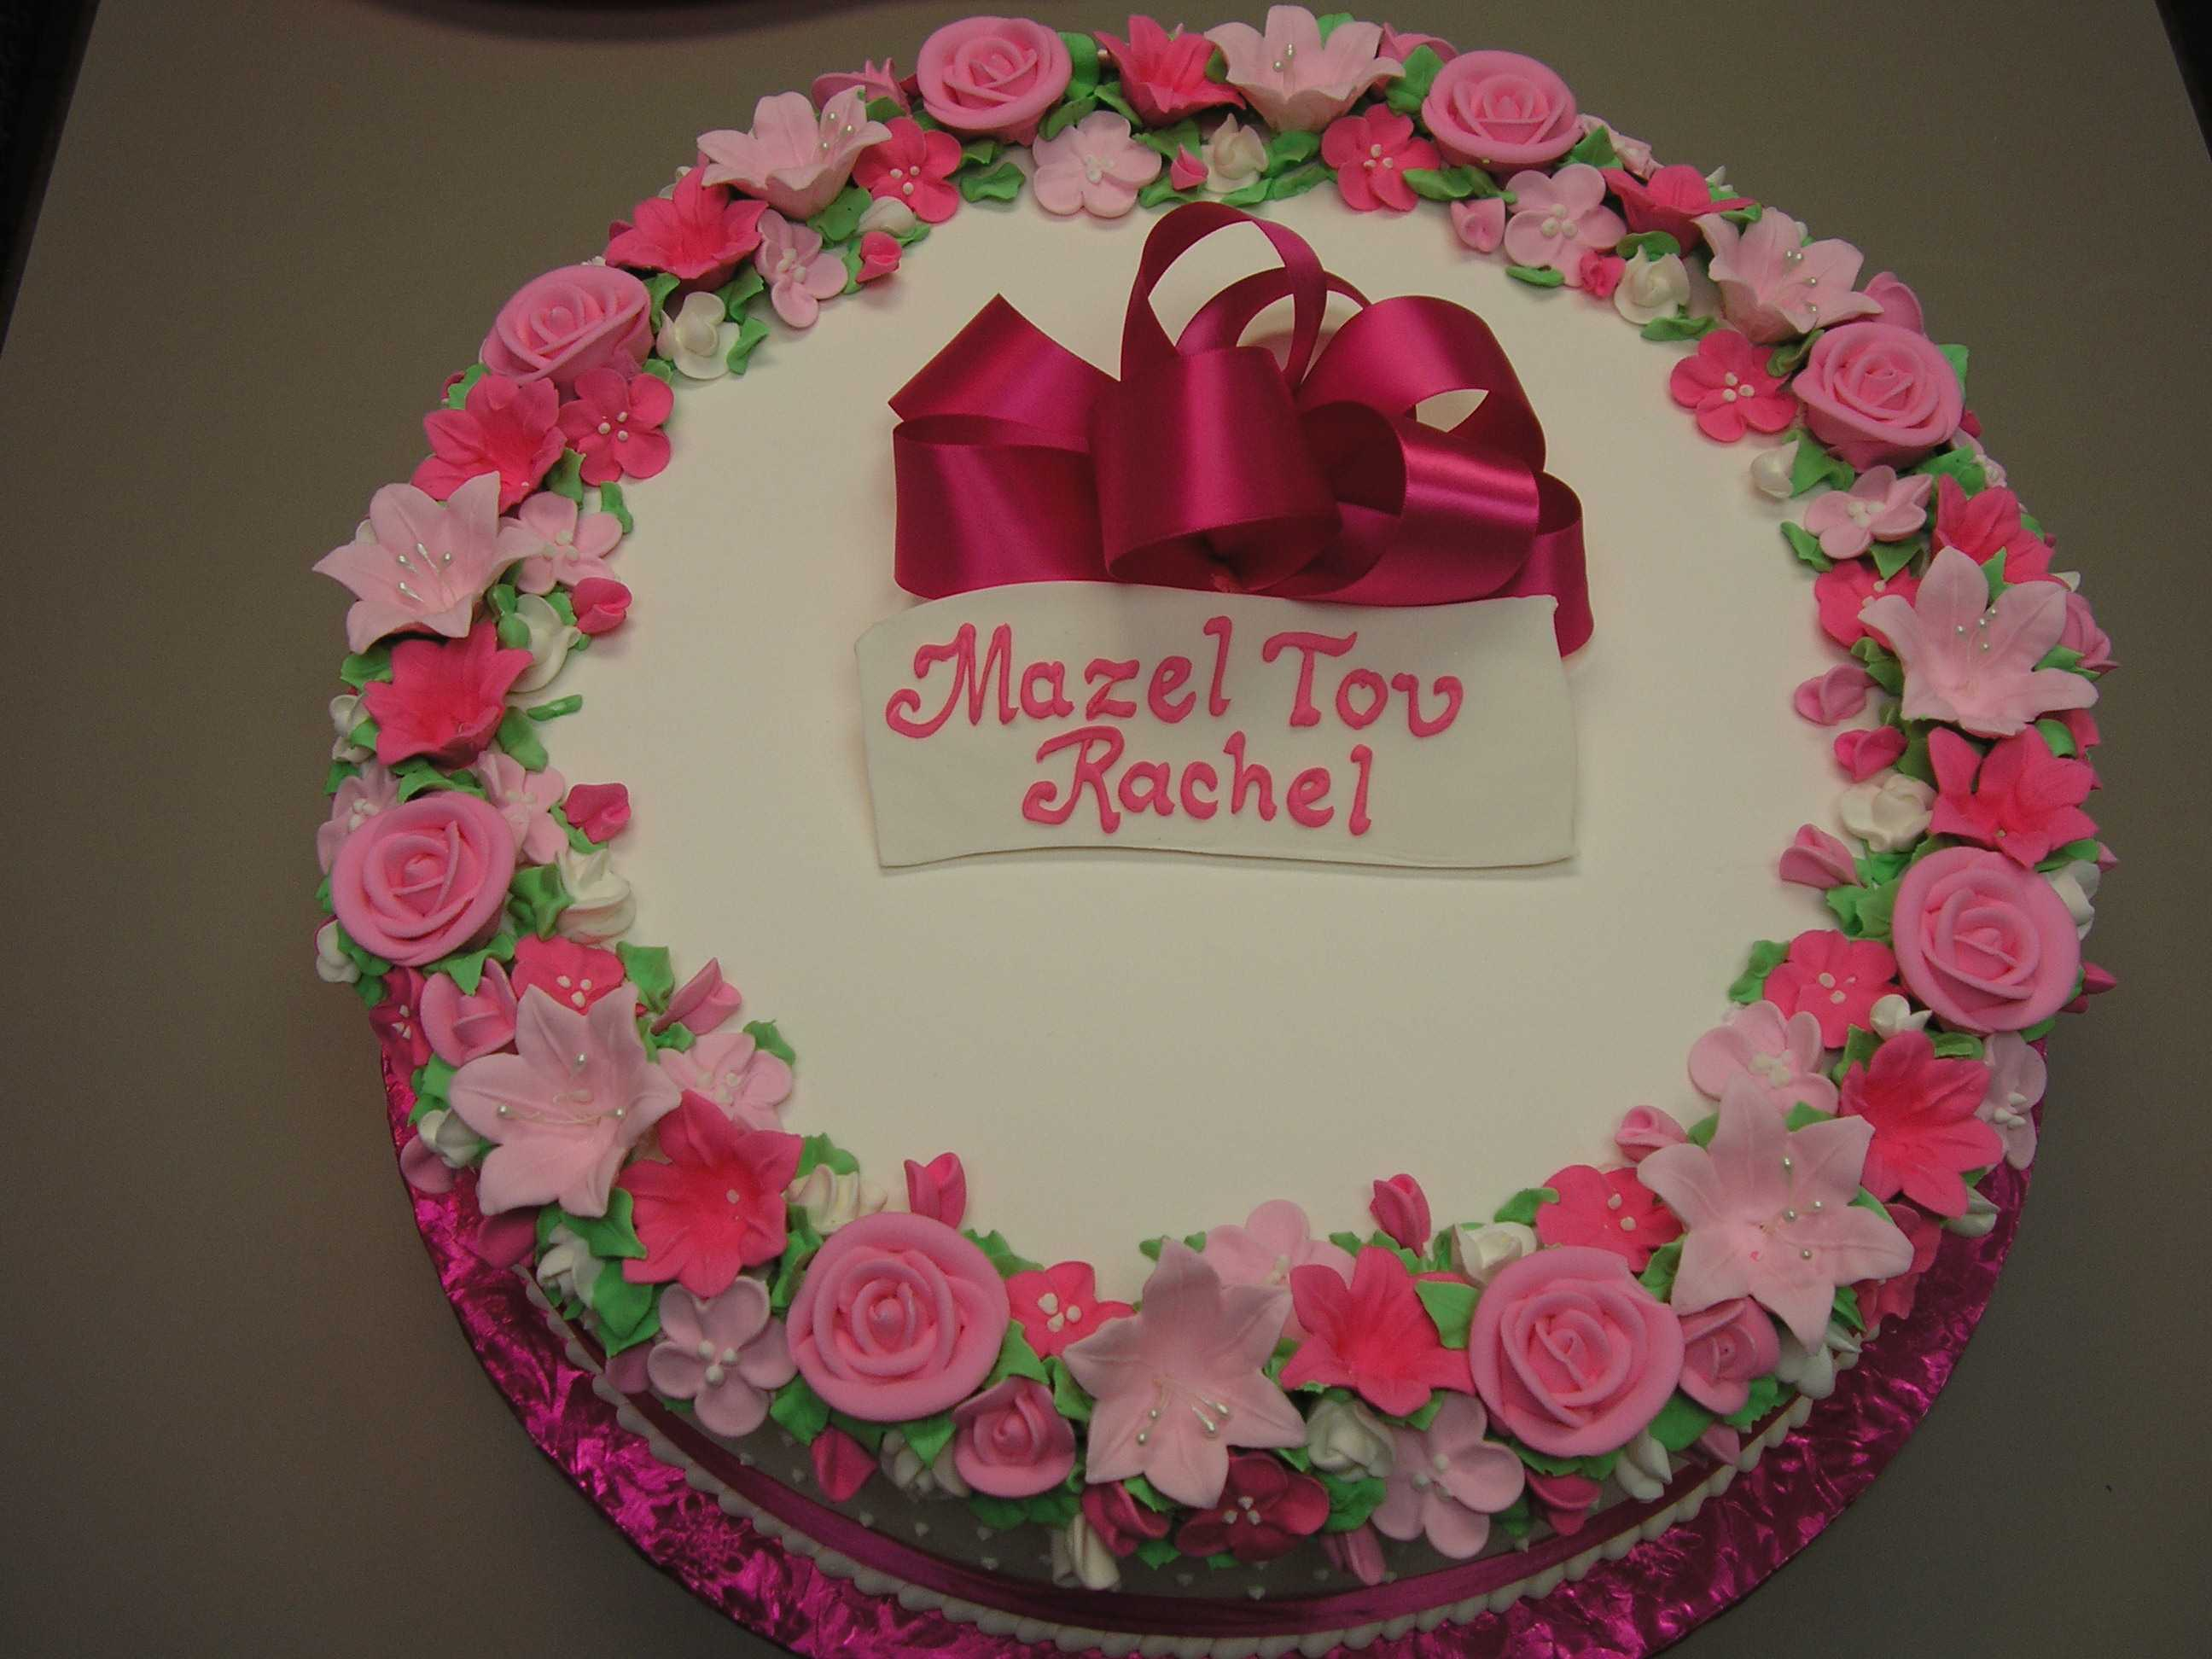 ring of flowers design around top of cake